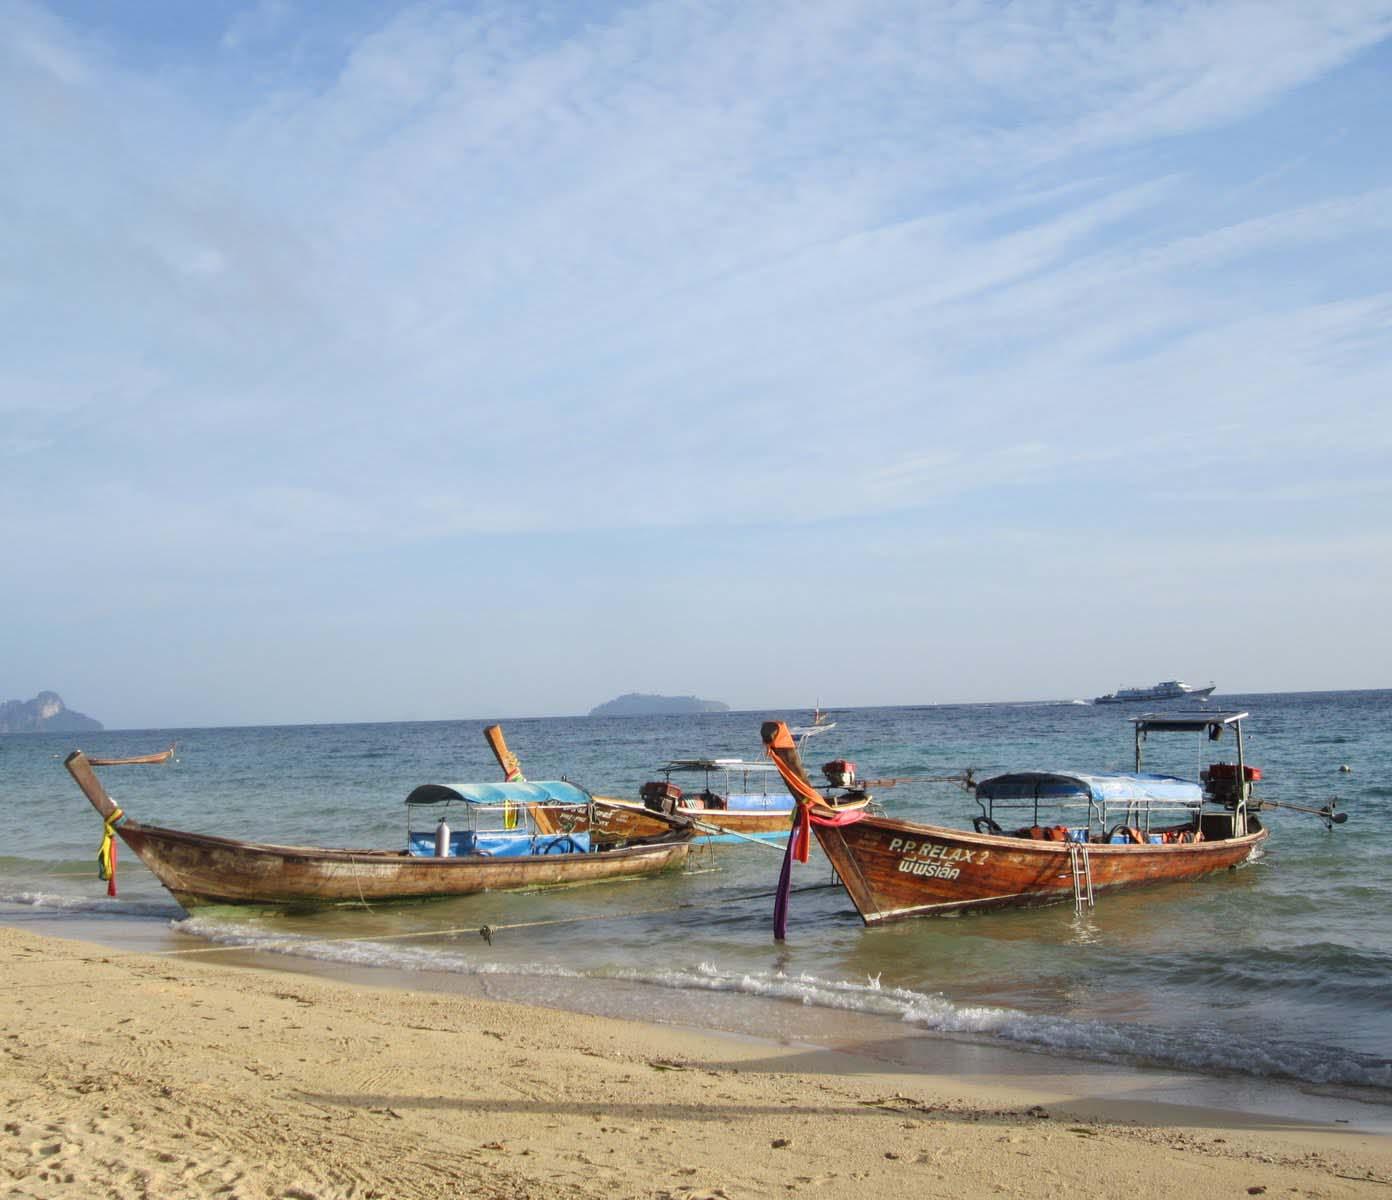 Phi Phi Relax Beach Resort: Fash N' Travl: Febrero 2013